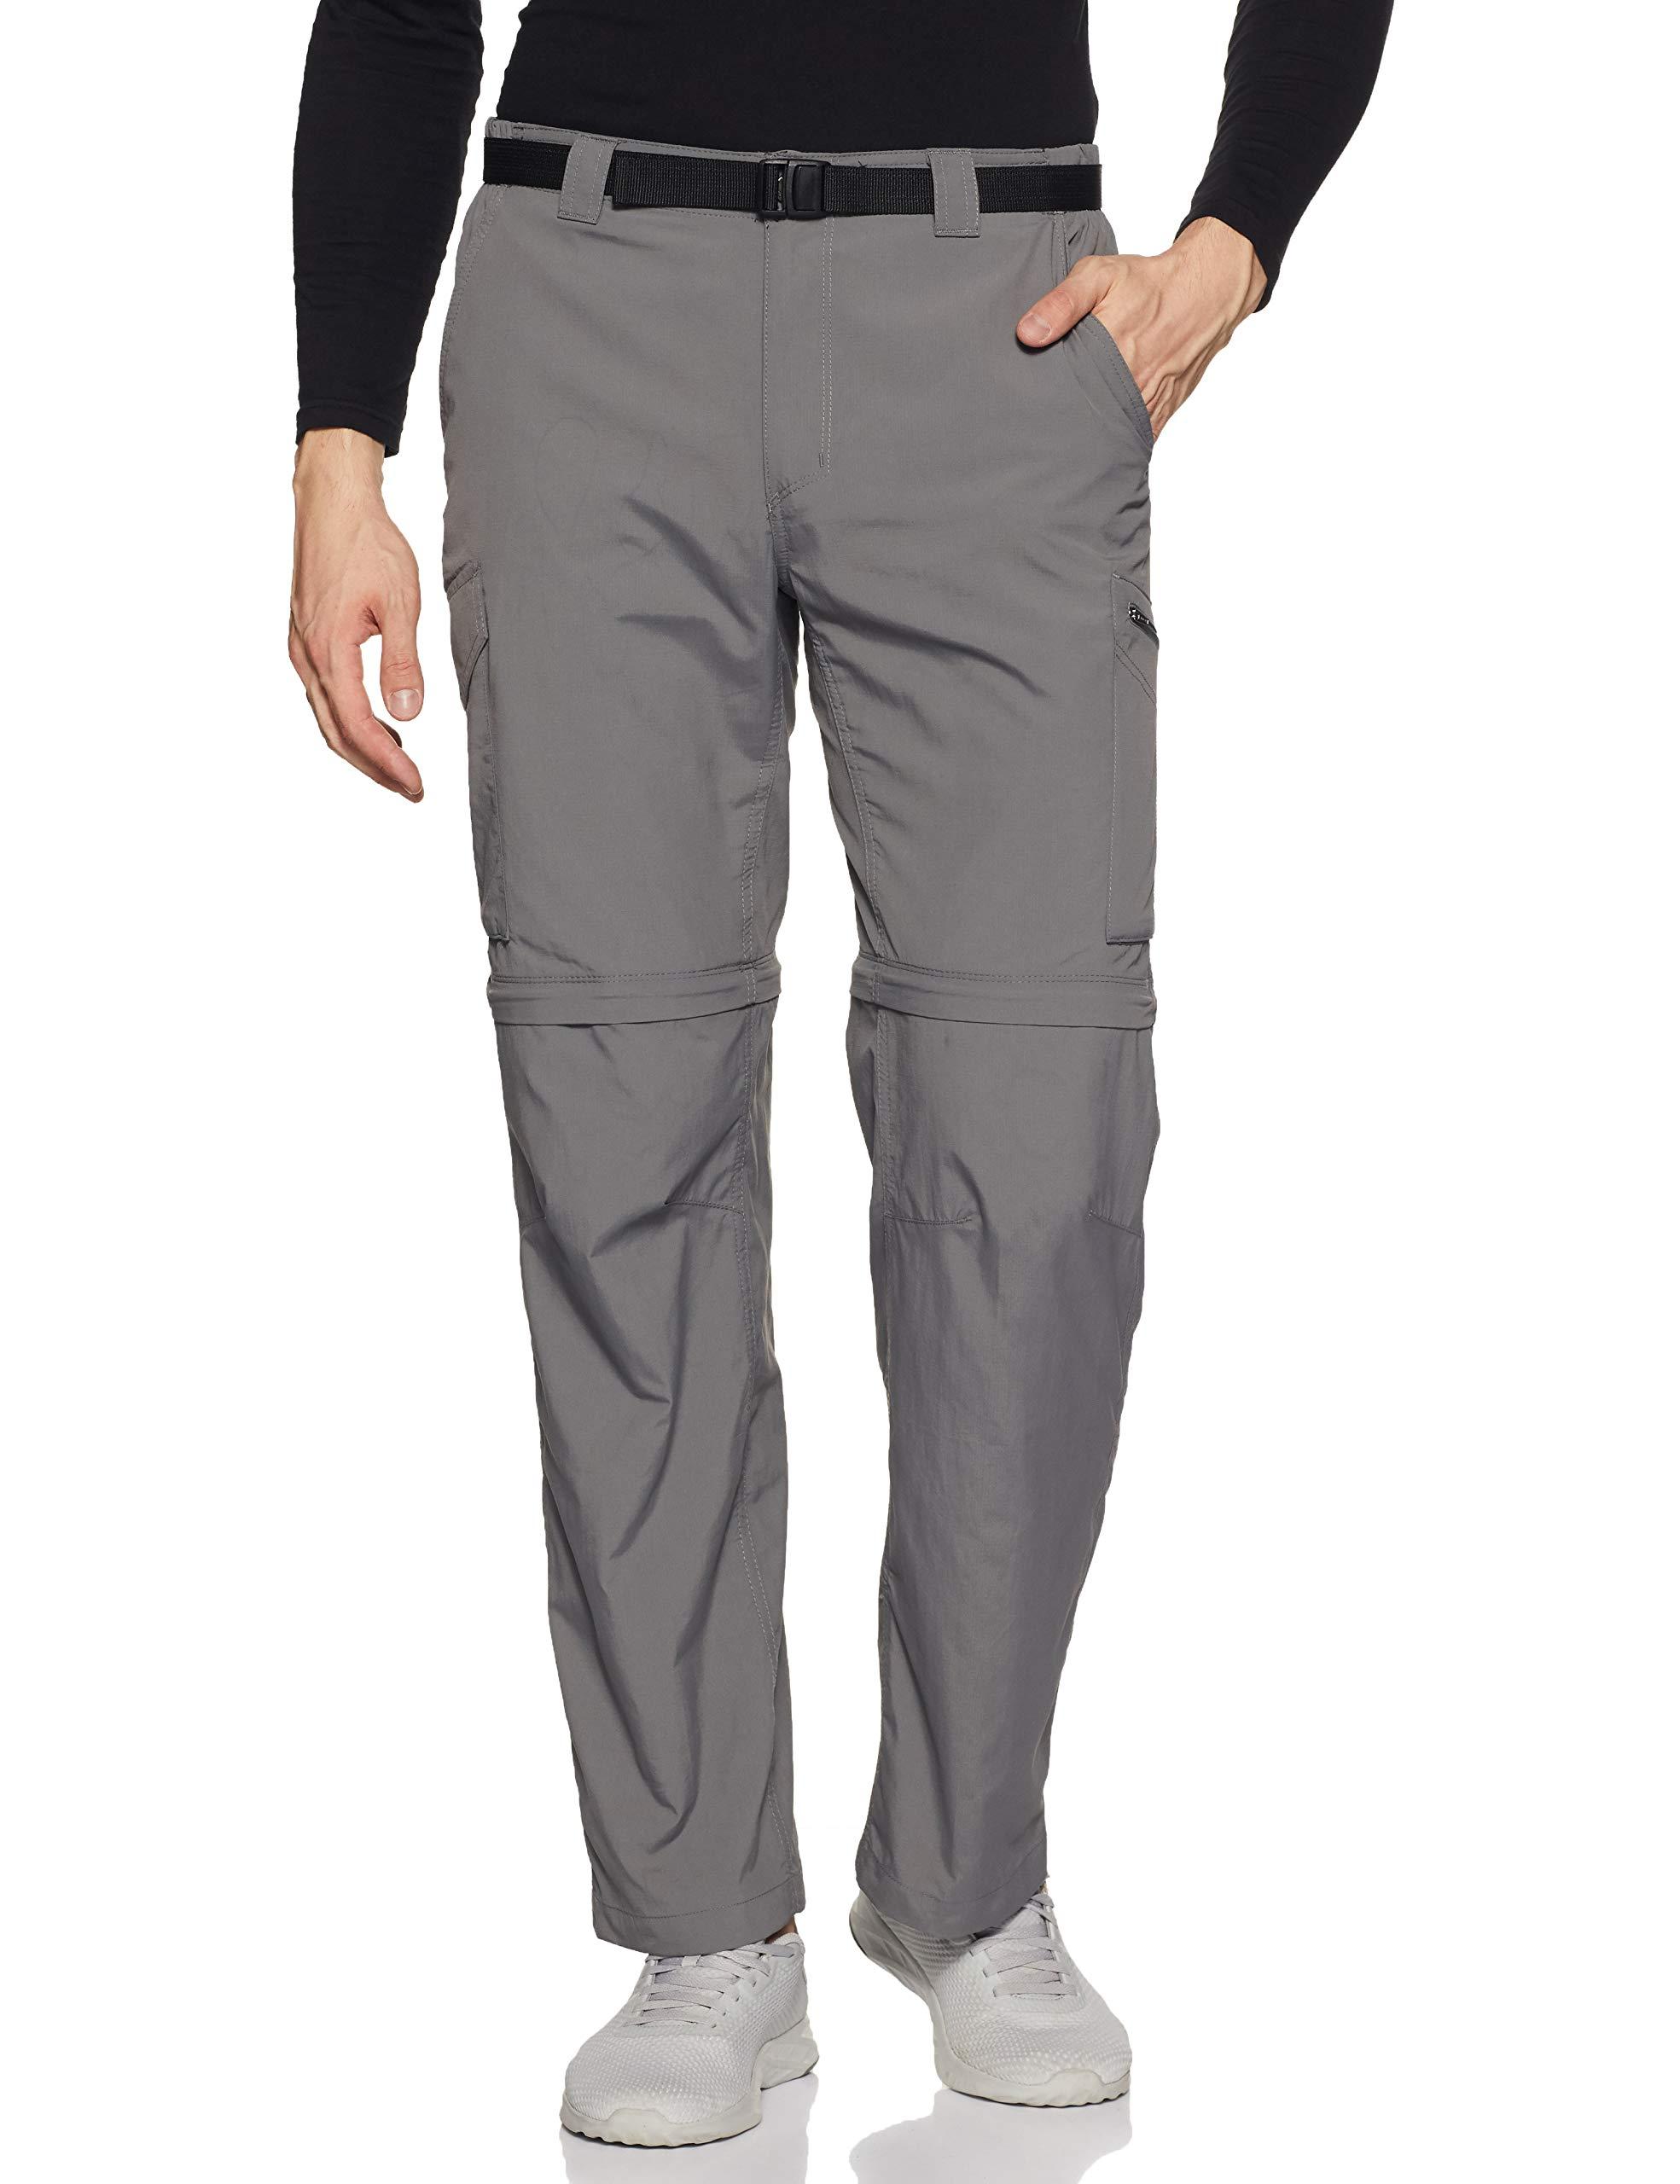 Choose SZ//color Sag Columbia Men/'s Silver Ridge Convertible Pants